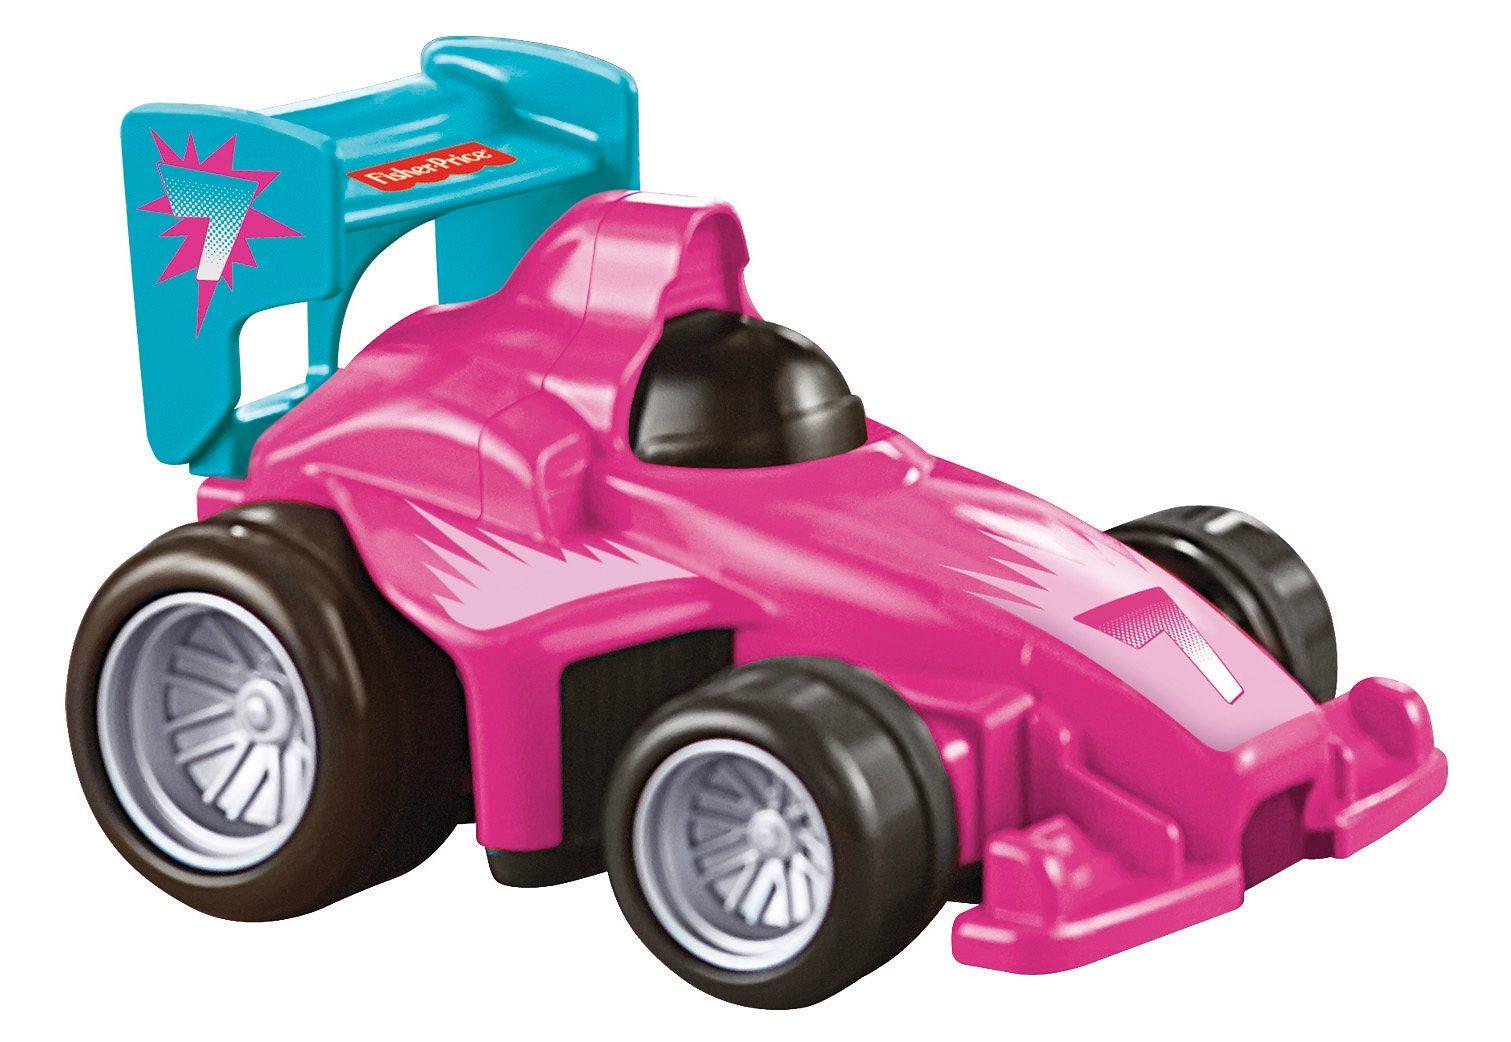 Fisher Price RC-Komplett-Set, »Fernlenkflitzer pink«